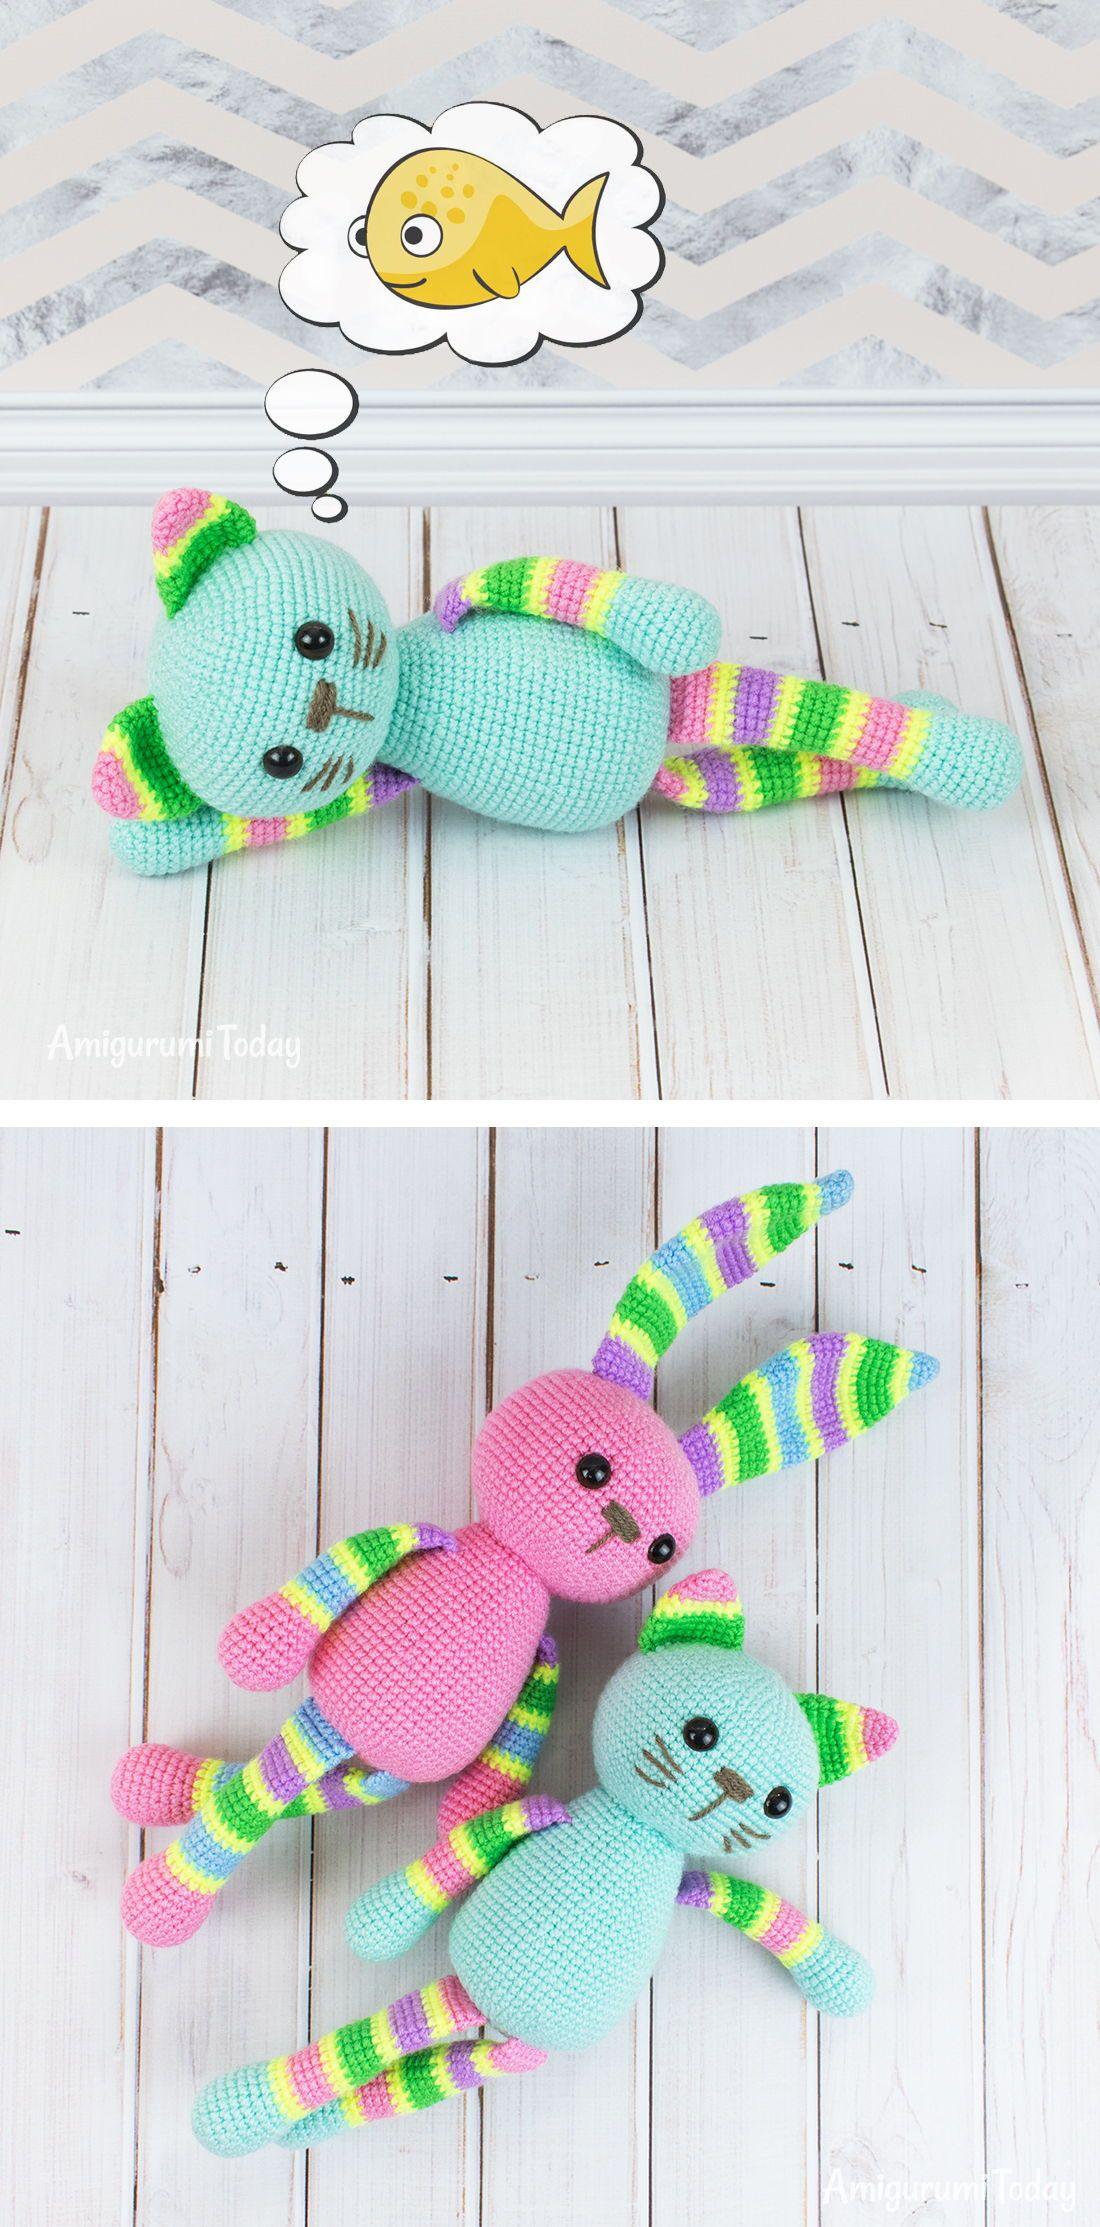 Stripy cat amigurumi pattern | Pinterest | Patrón de ganchillo ...